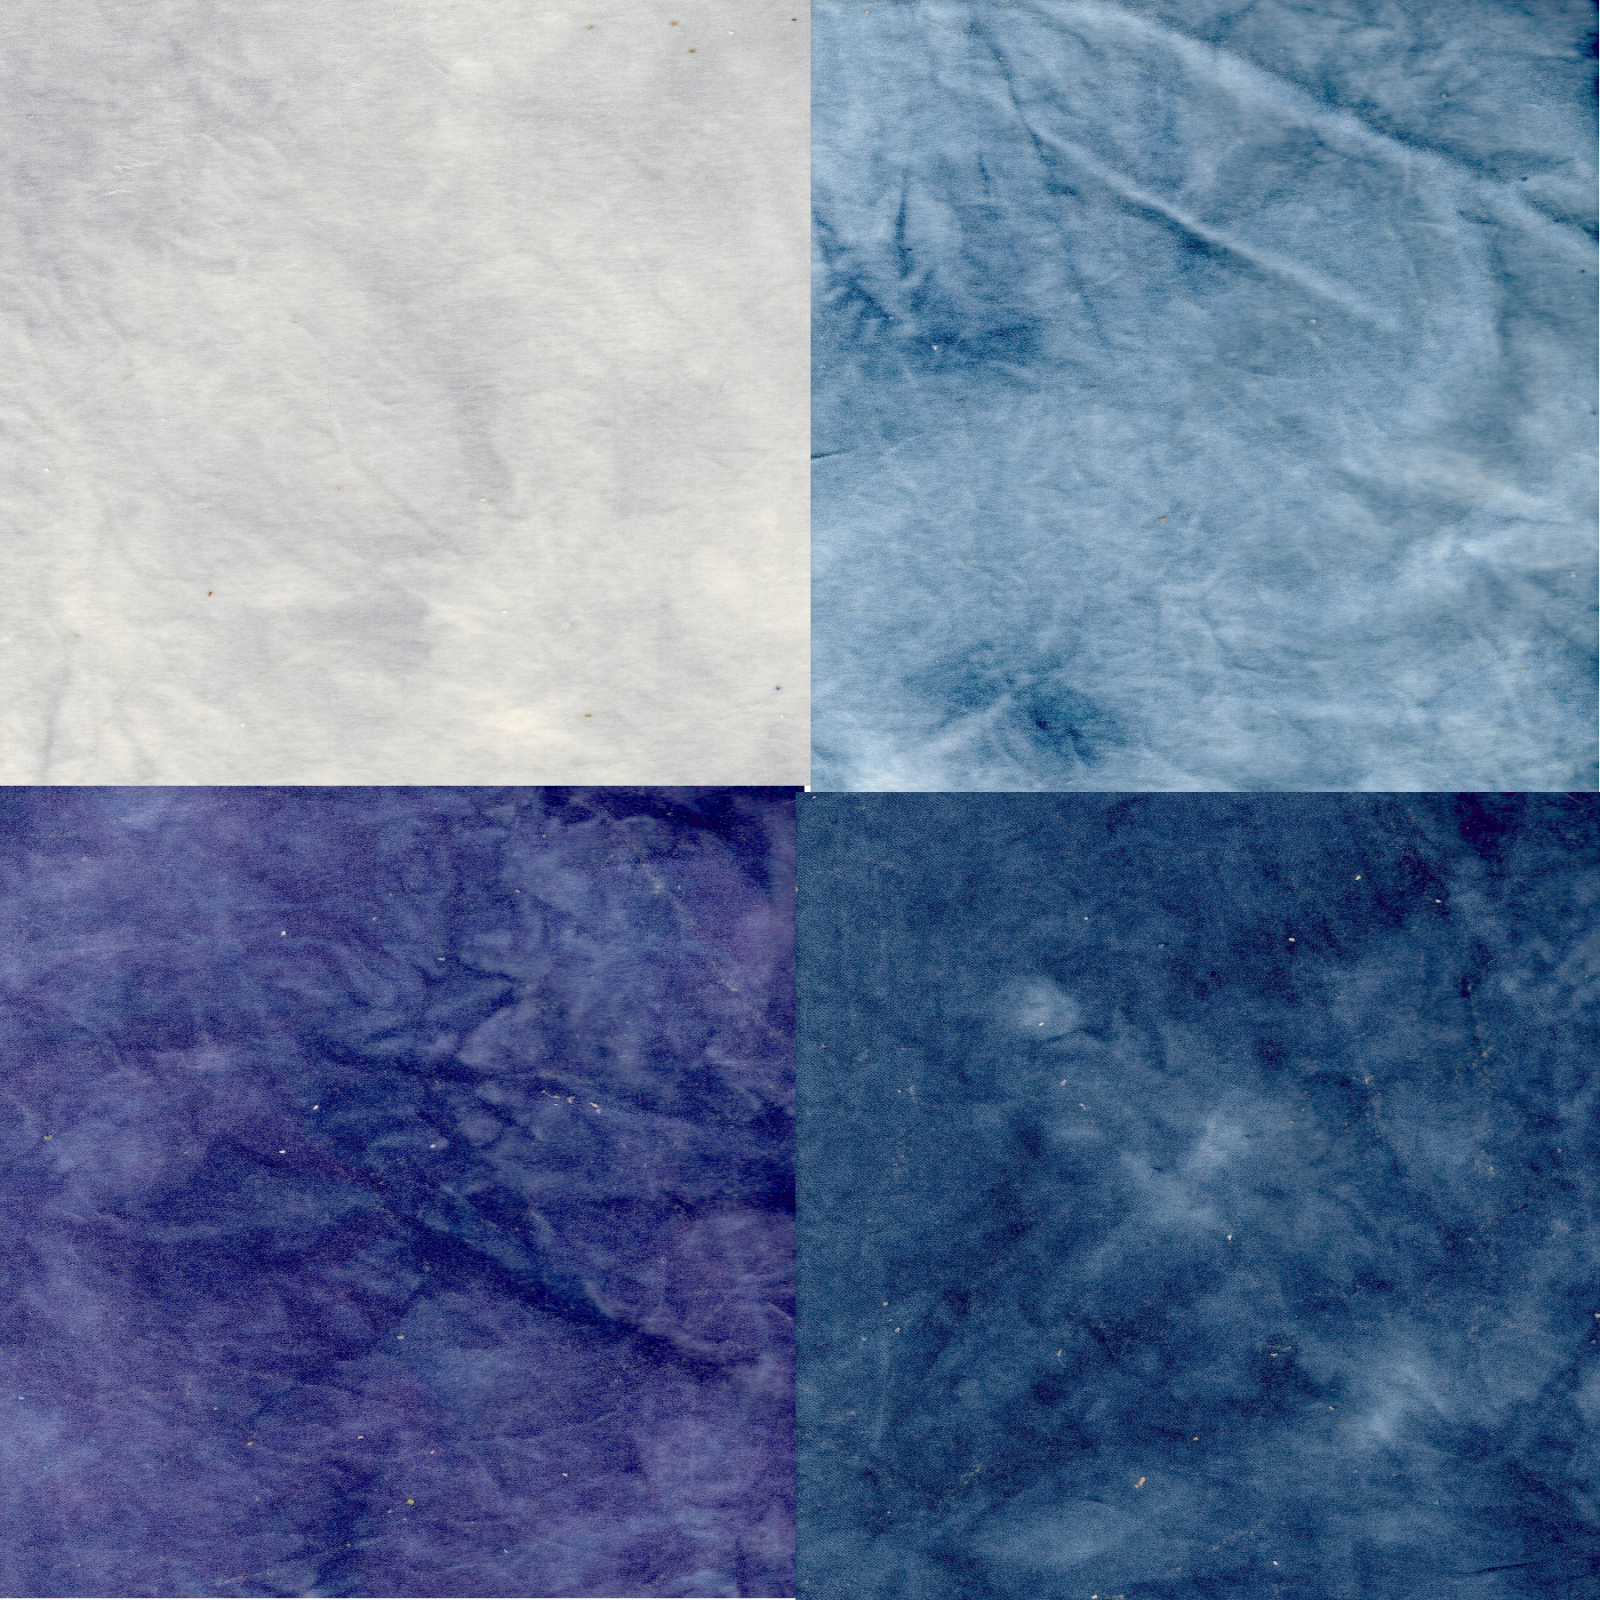 Ocean Waves 4pc Hand-Dyed Cotton Velveteen